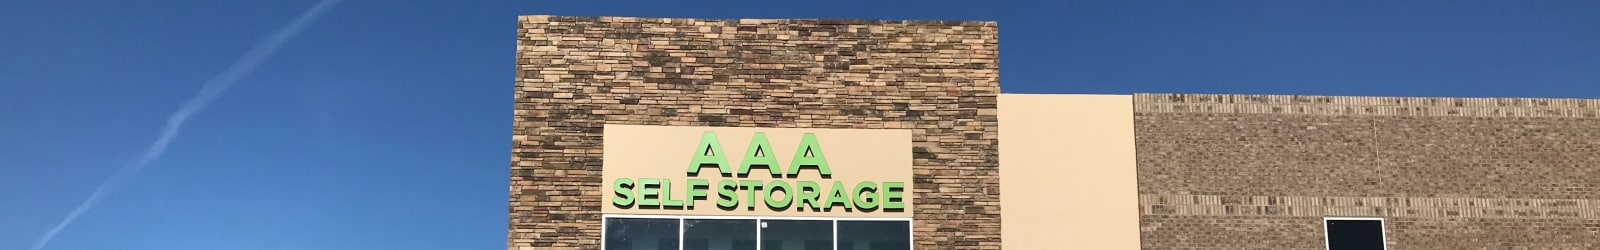 Self storage units at AAA Self Storage at Jag Branch Blvd in Kernersville, NC